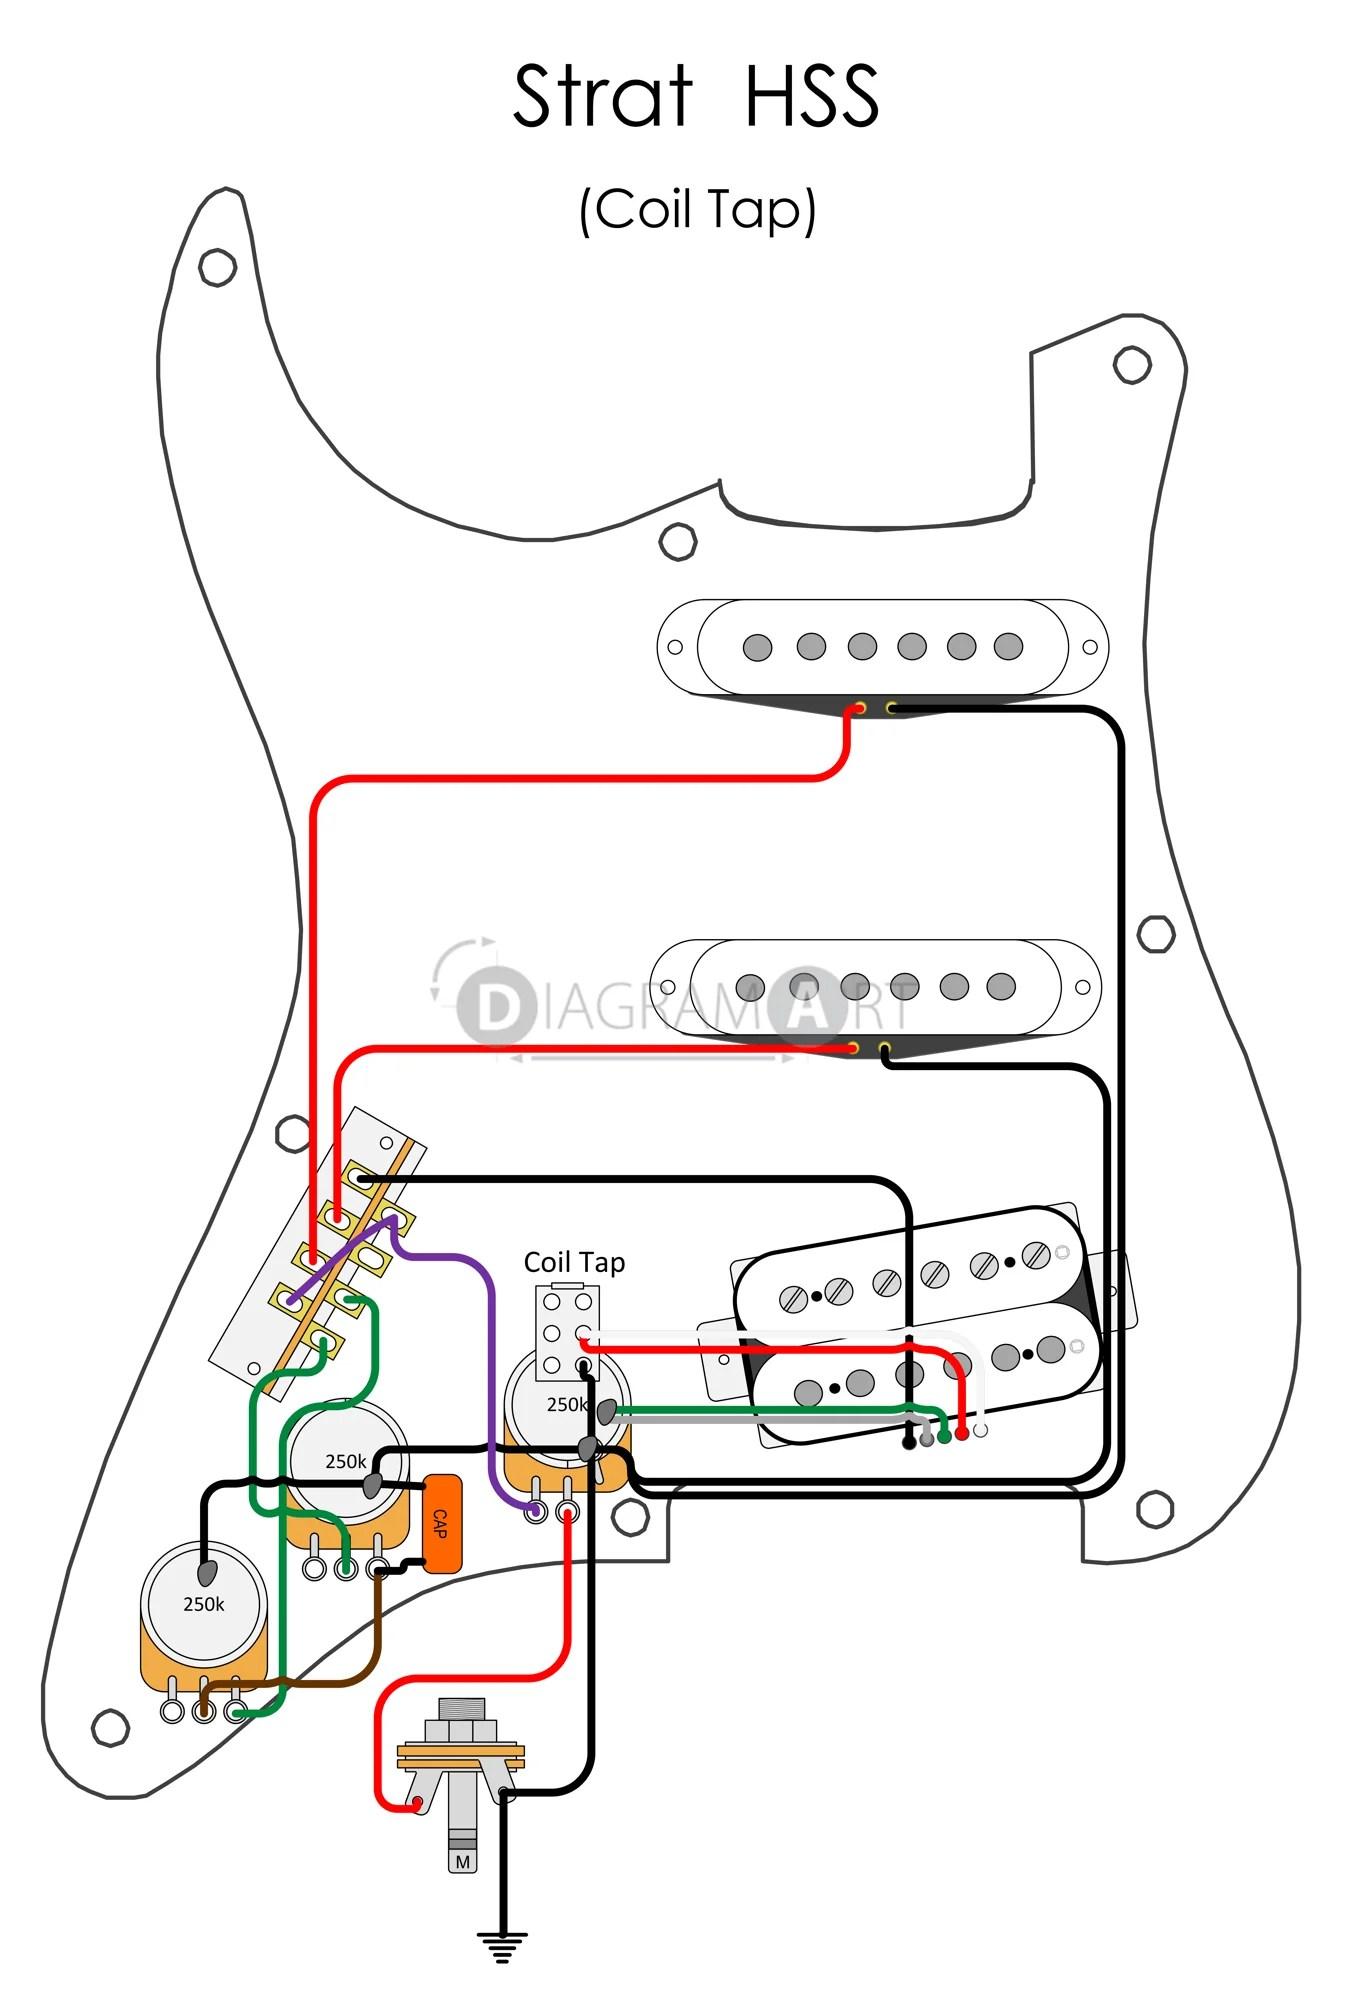 [DIAGRAM_38YU]  Circuit Diagram Electric Guitar | Fender Hss Strat Wiring Diagram |  | Wiring Diagram